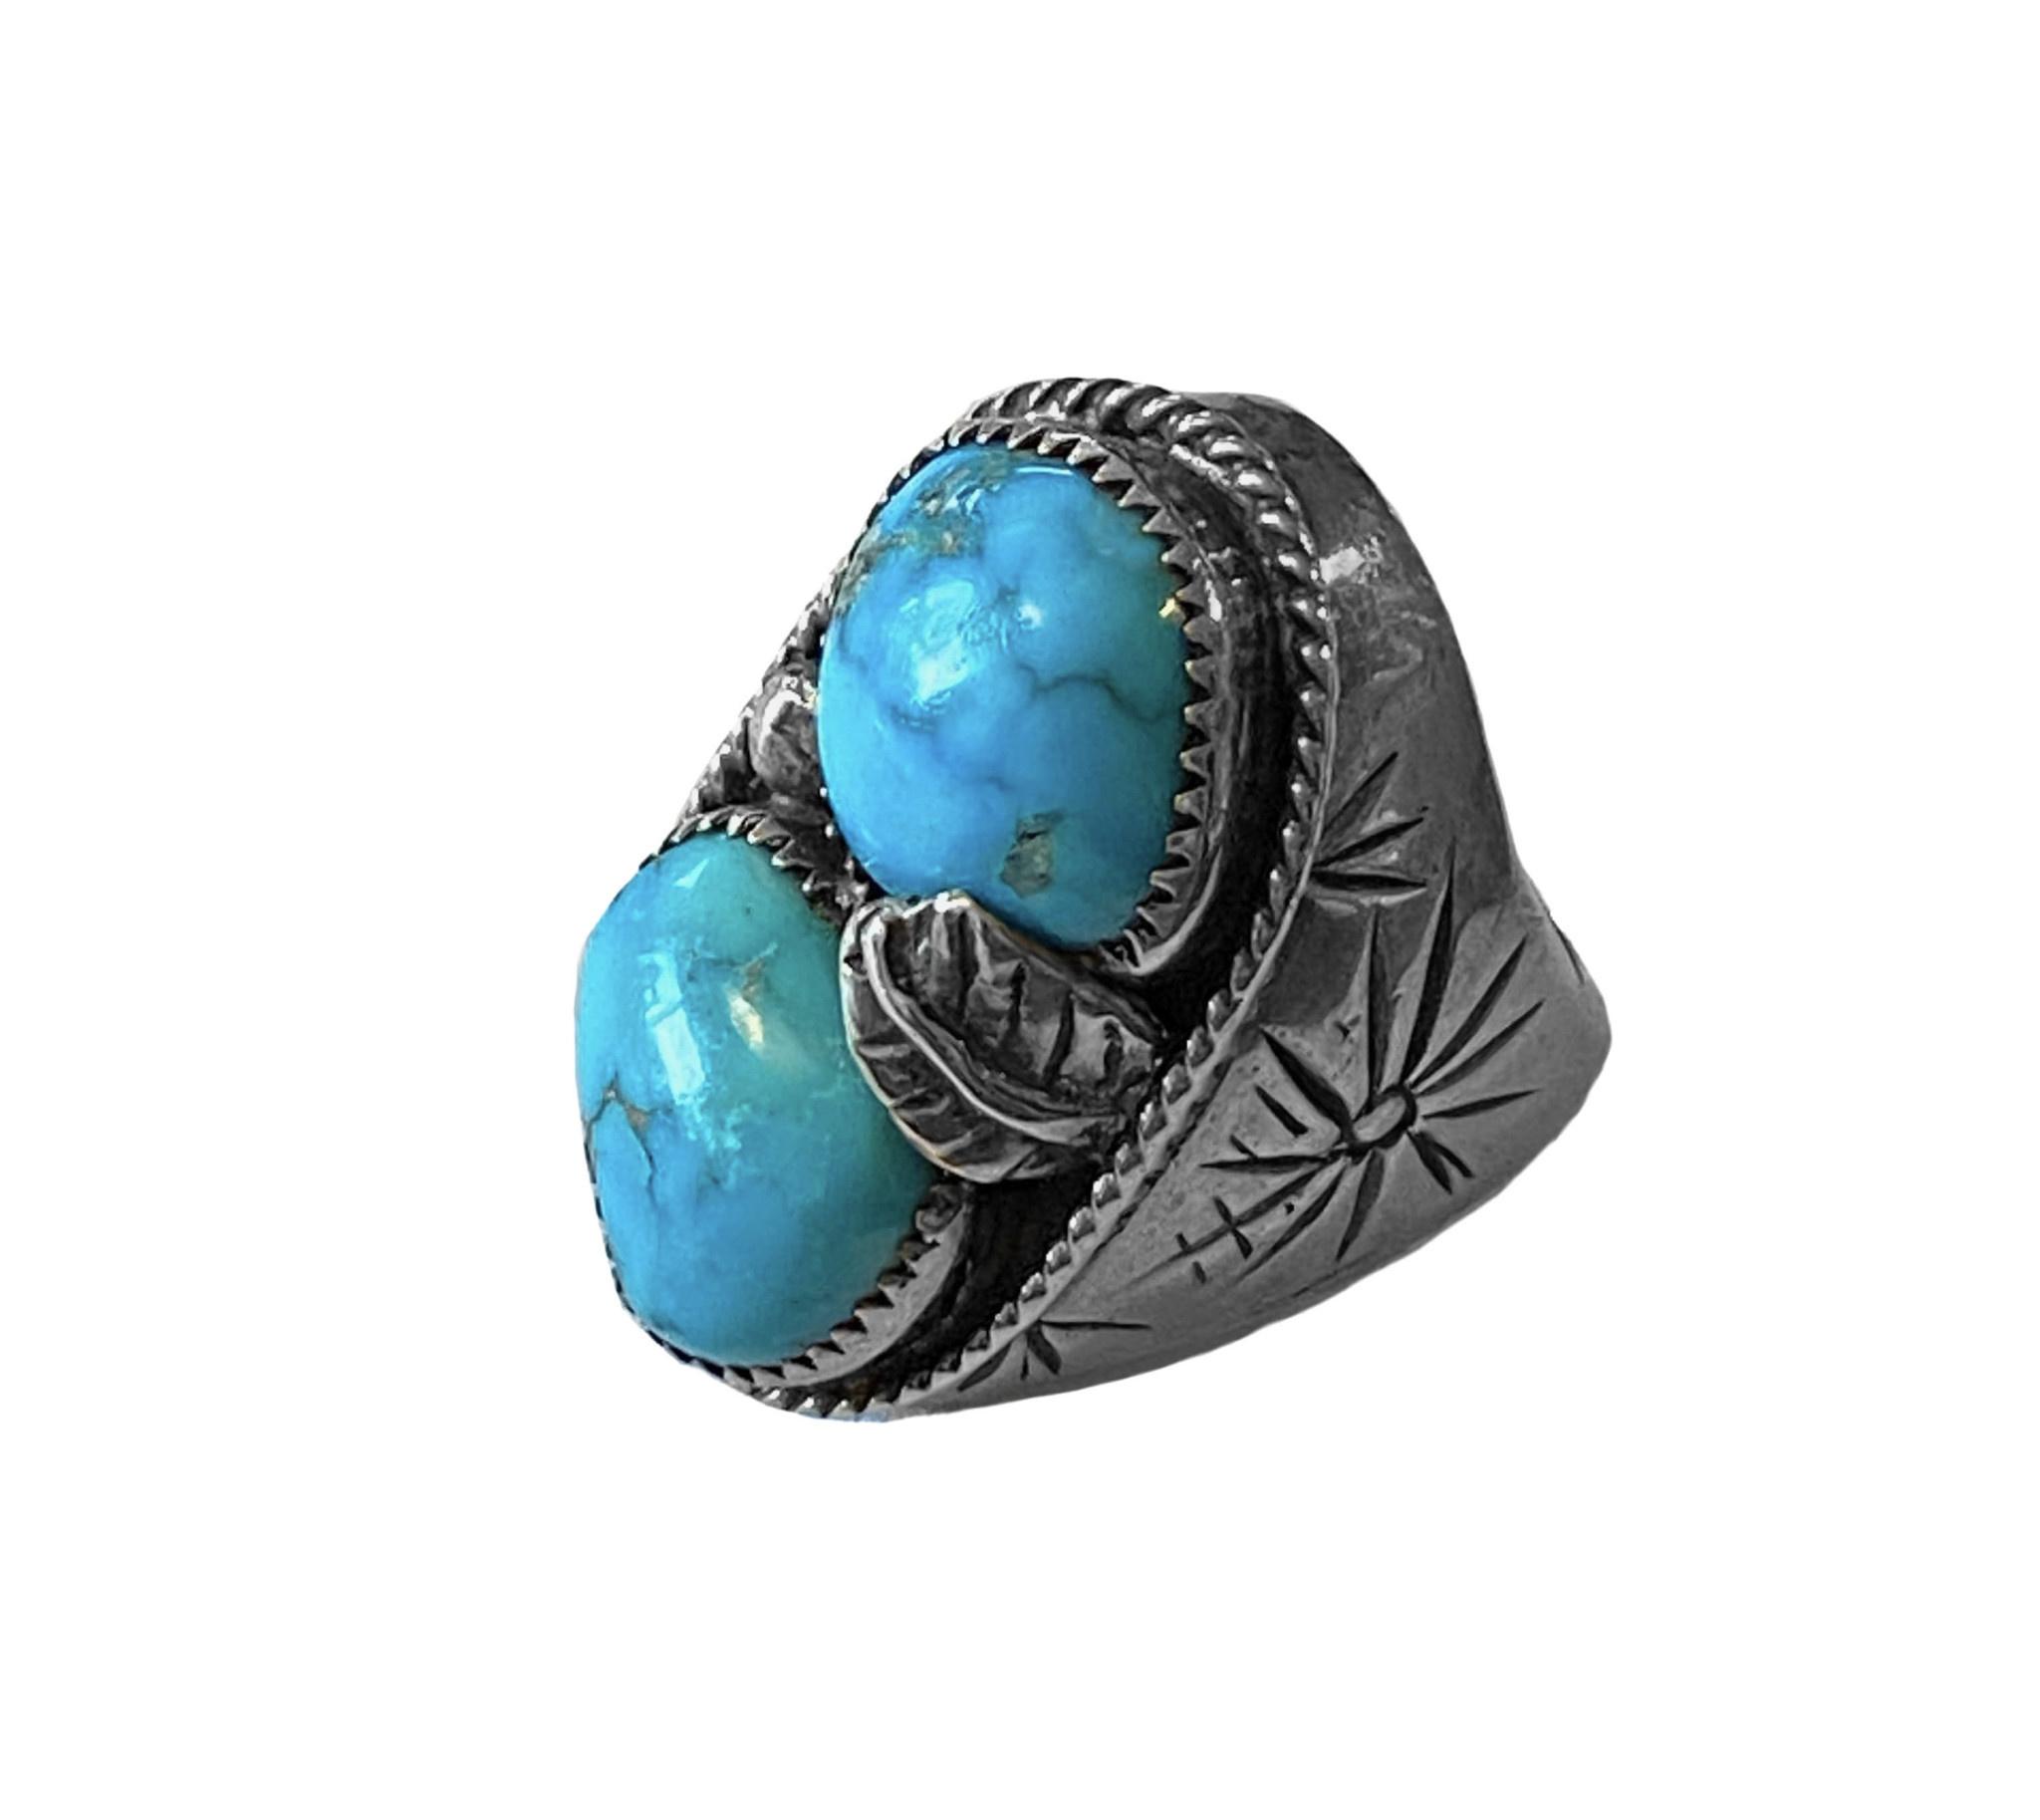 Vintage 2 Stone Turquoise Man's Ring